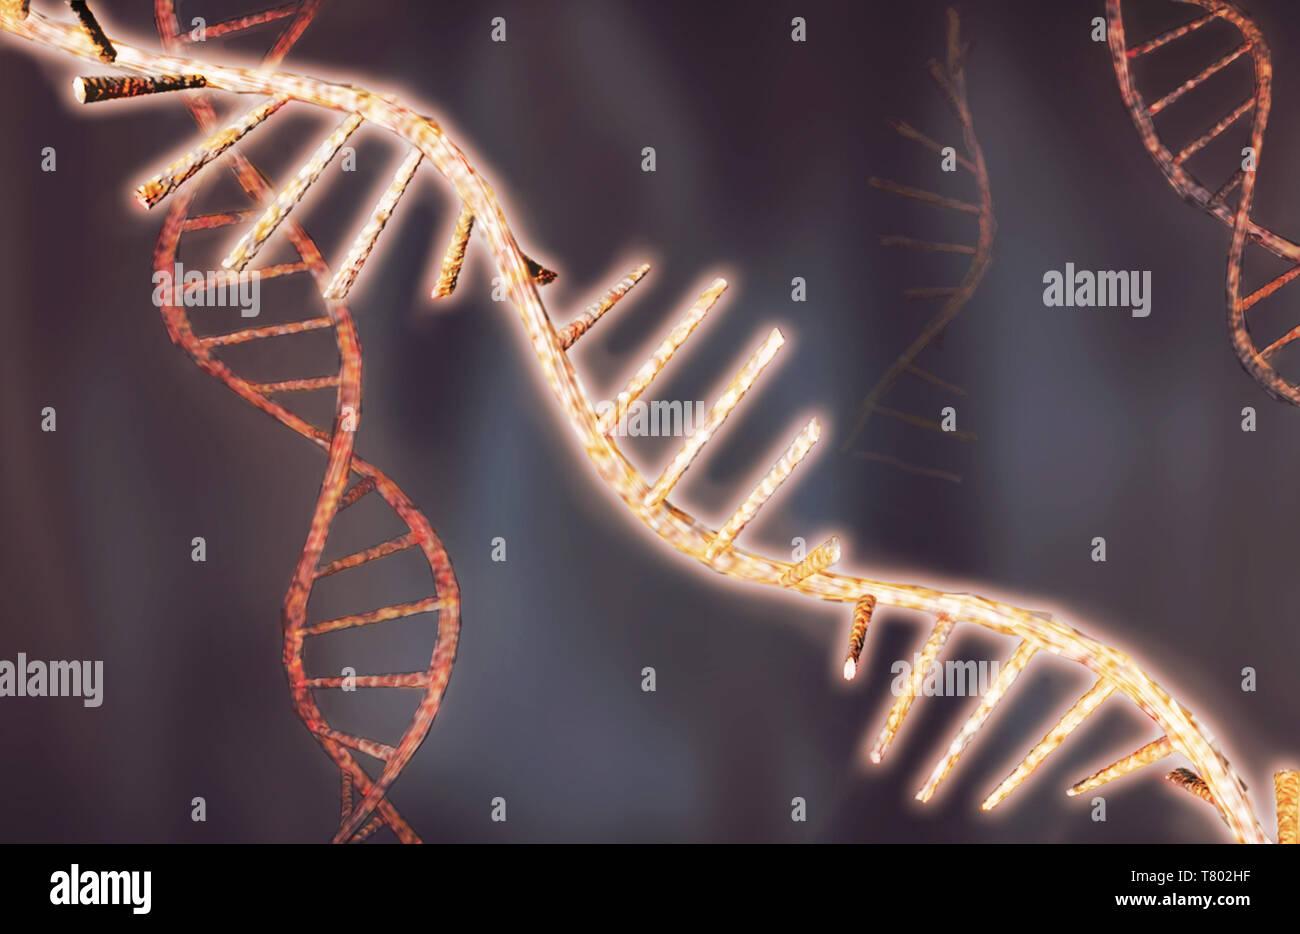 RNA, Illustration - Stock Image